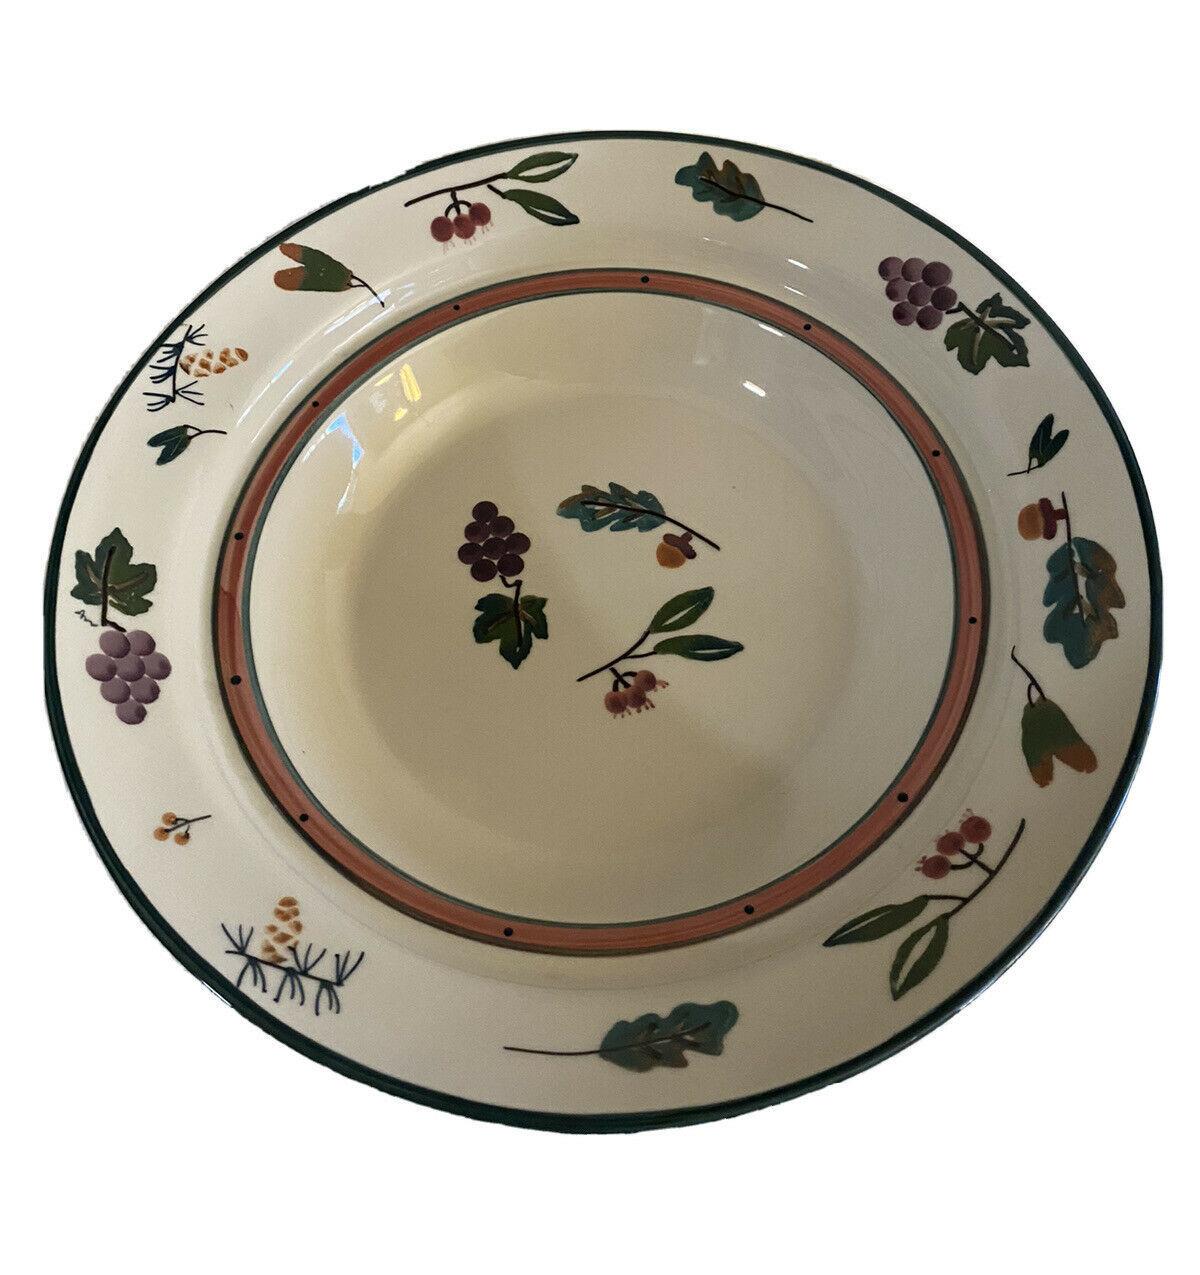 "1981 Hartstone Pottery  WOODLAND Pasta Serving Bowl - XL14-1/4"" - $39.99"